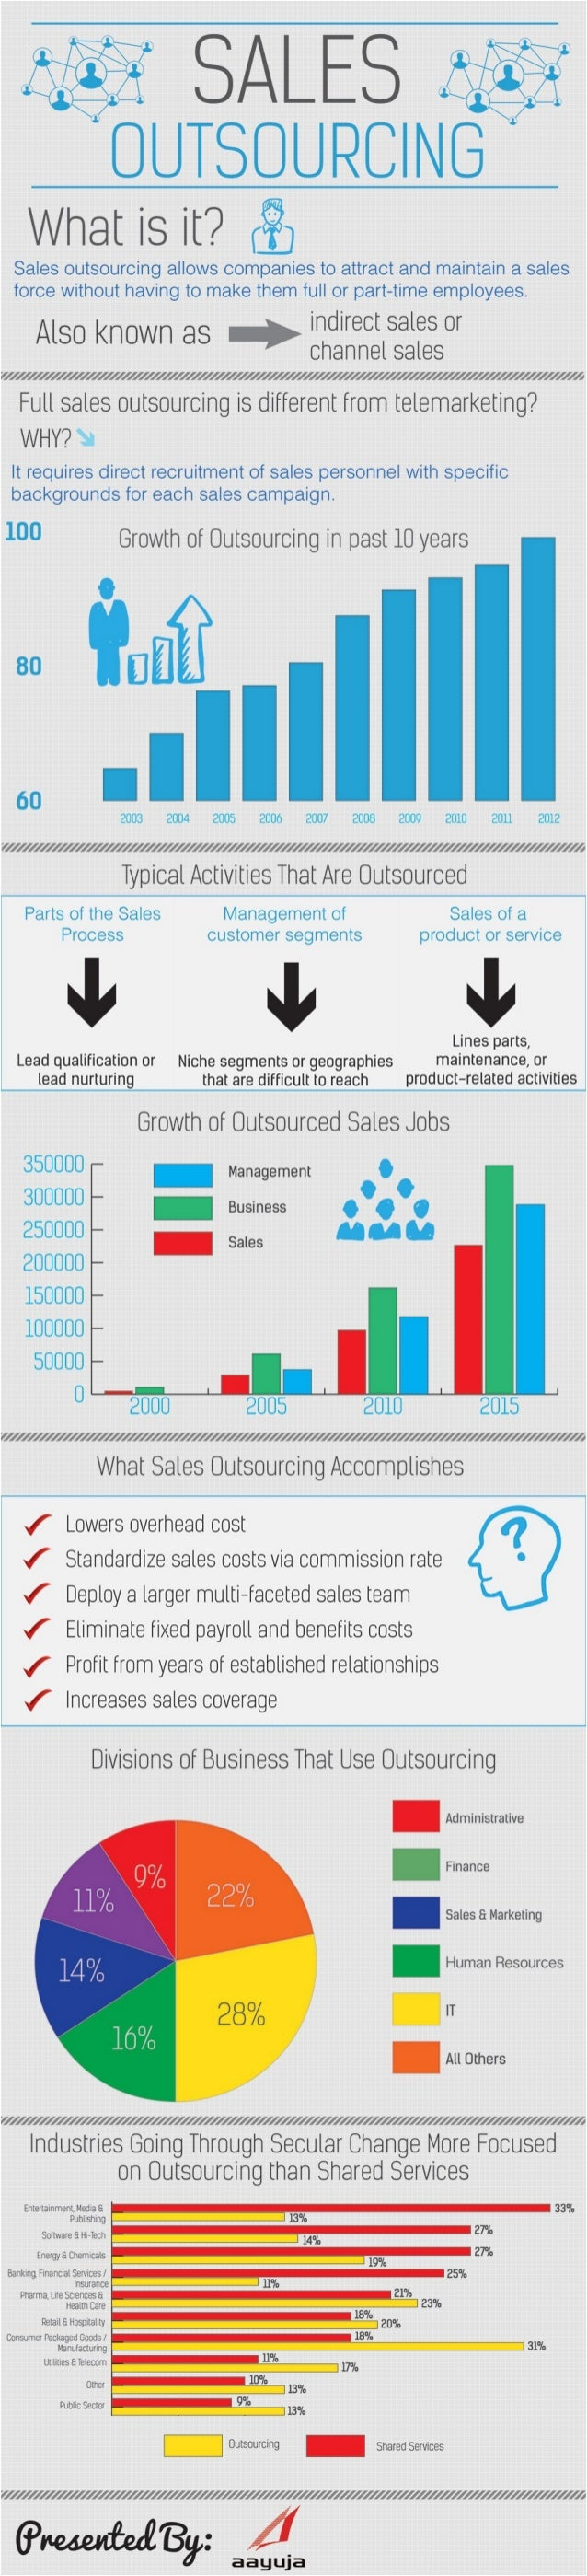 Sales Outsourcing Factsheet